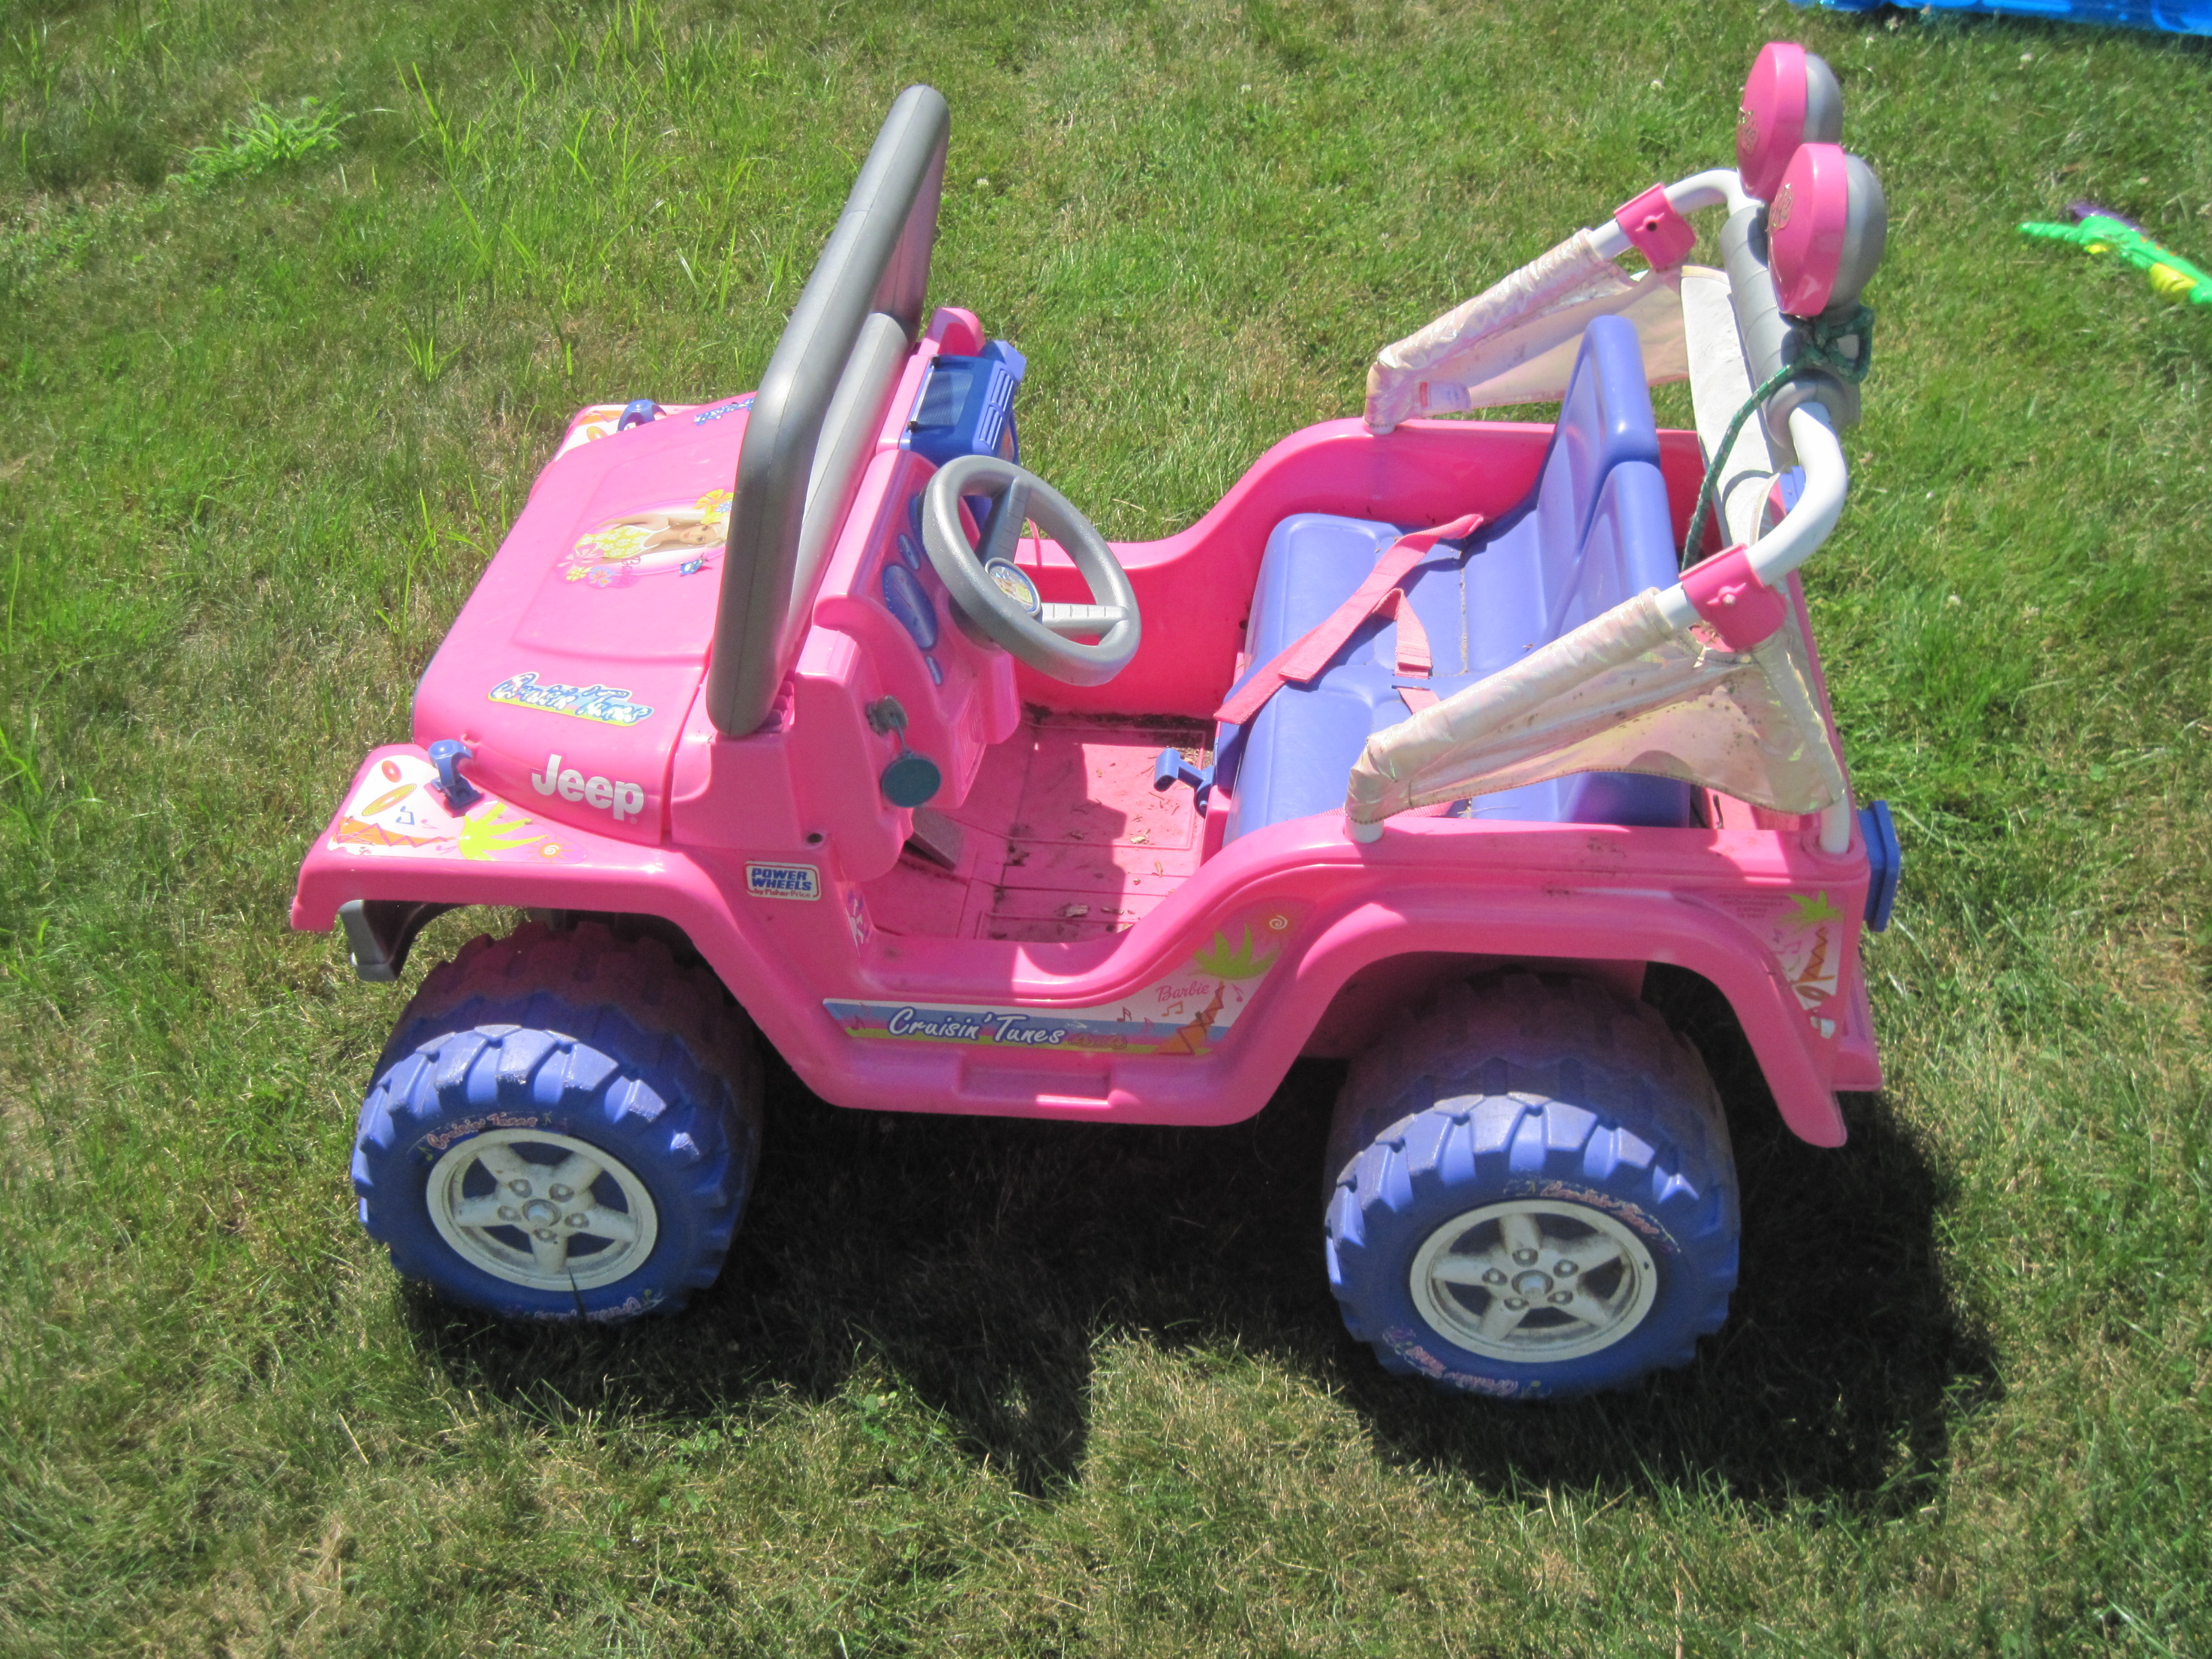 Power wheels jeep robot